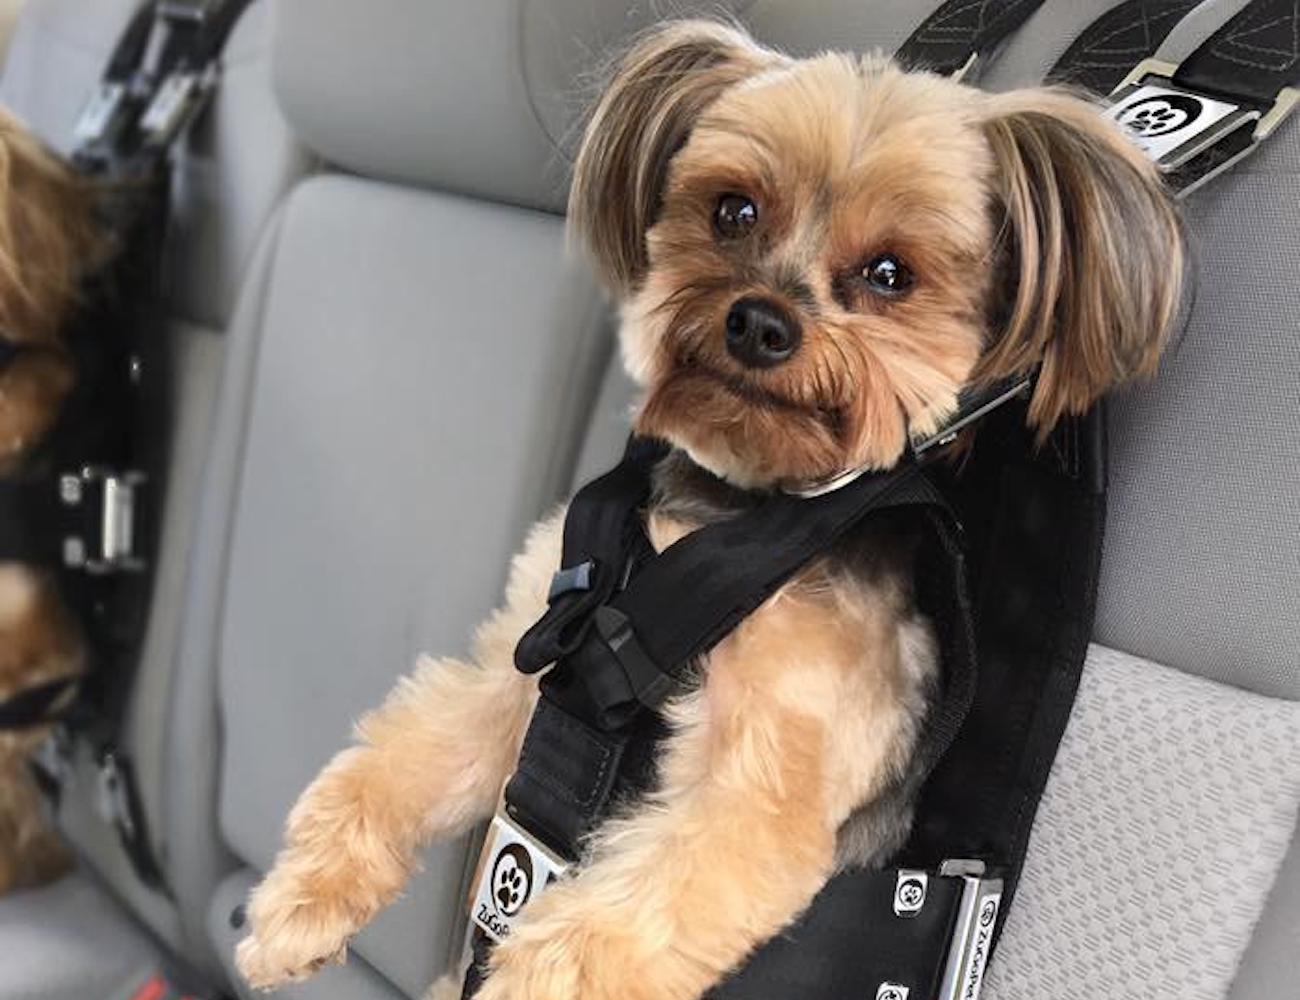 ZuGoPet Rocketeer Pack Multifunctional Dog Harness